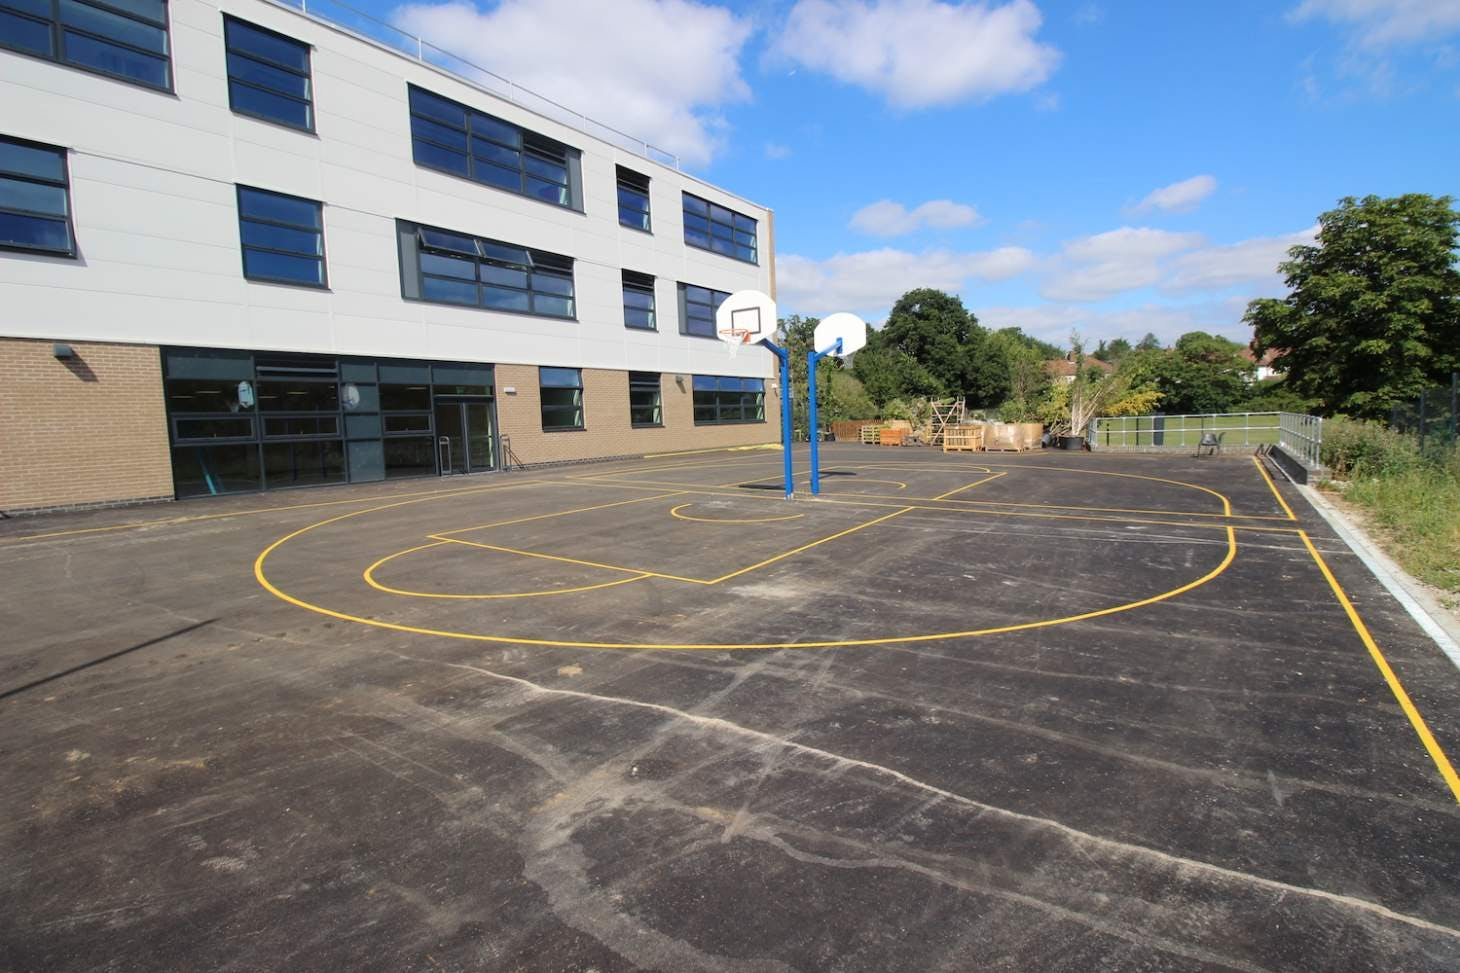 Ark Pioneer Academy Pitch | Hard (macadam) hockey pitch